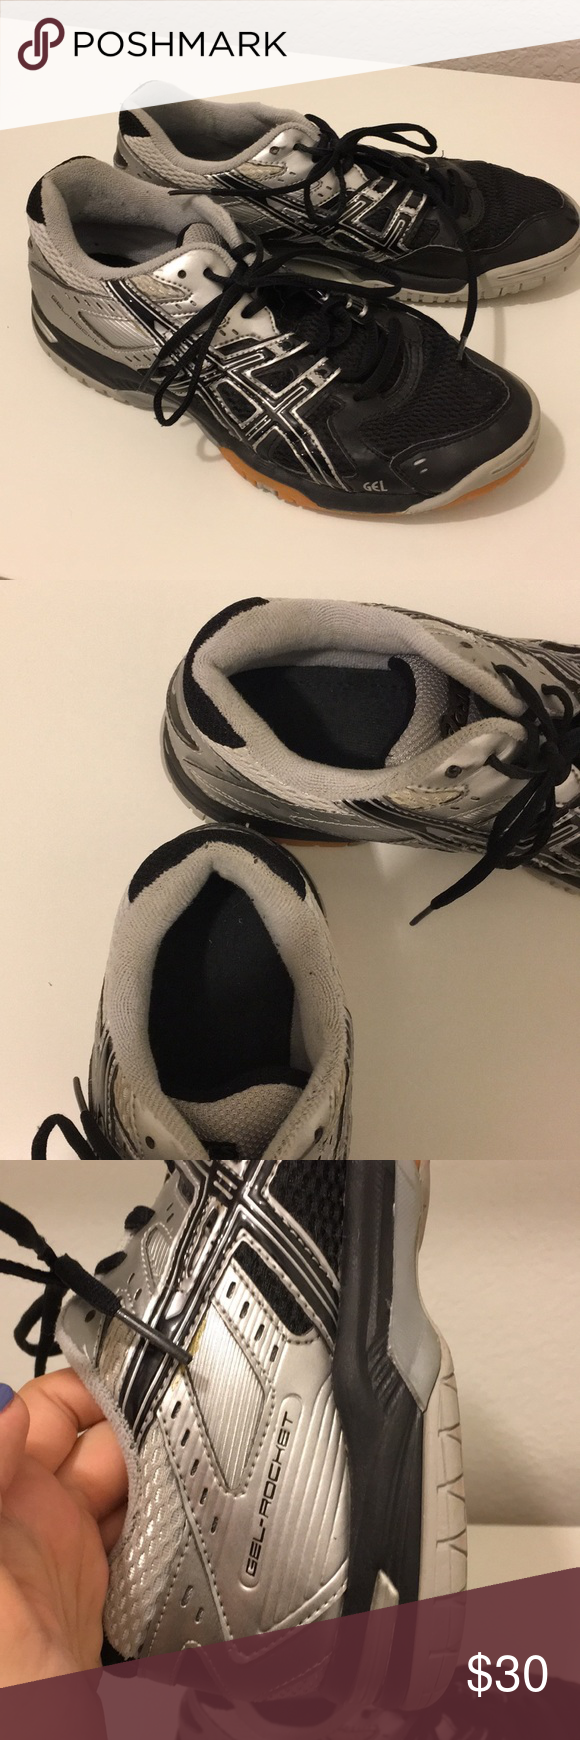 Asics Volleyball Shoes In 2020 Asics Volleyball Shoes Volleyball Shoes Asics